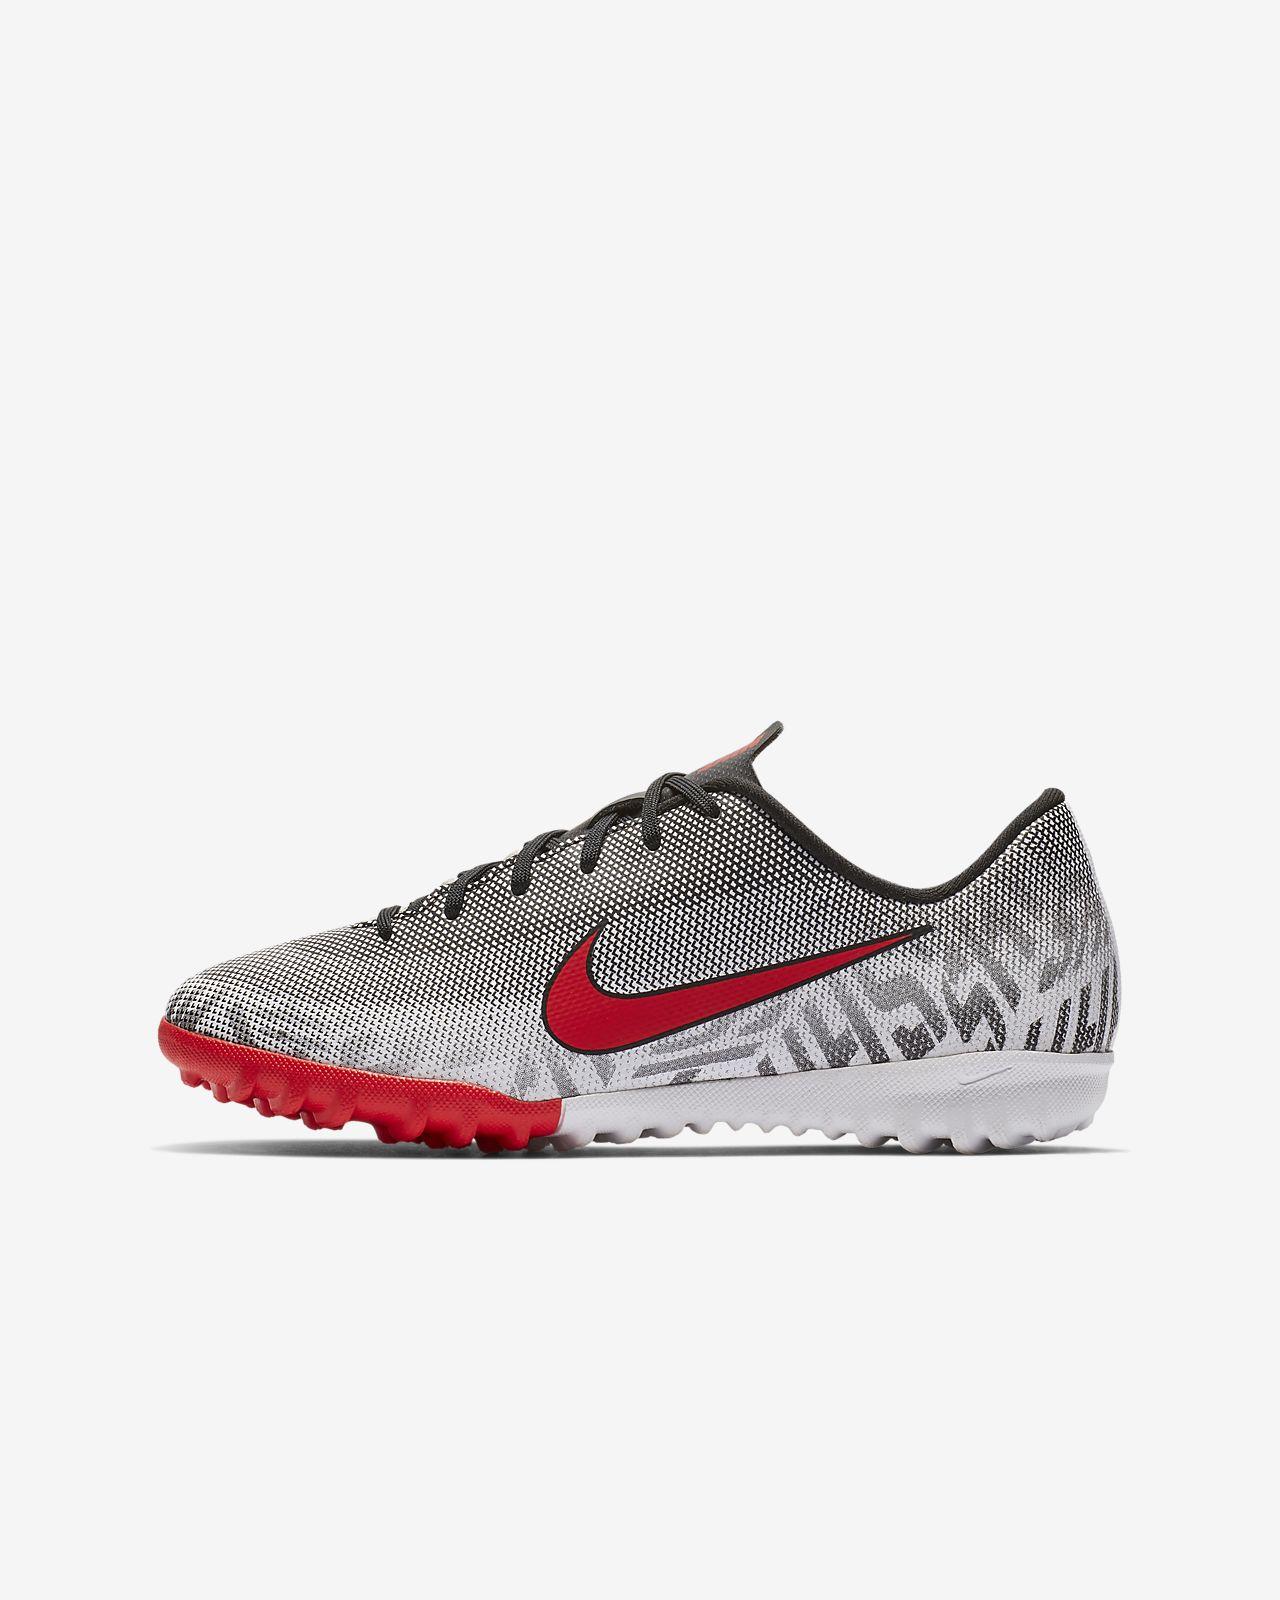 buy online 4125e 99b38 ... Nike Jr. Mercurial Vapor XII Academy Neymar Jr-fodboldskoe til  små/store børn